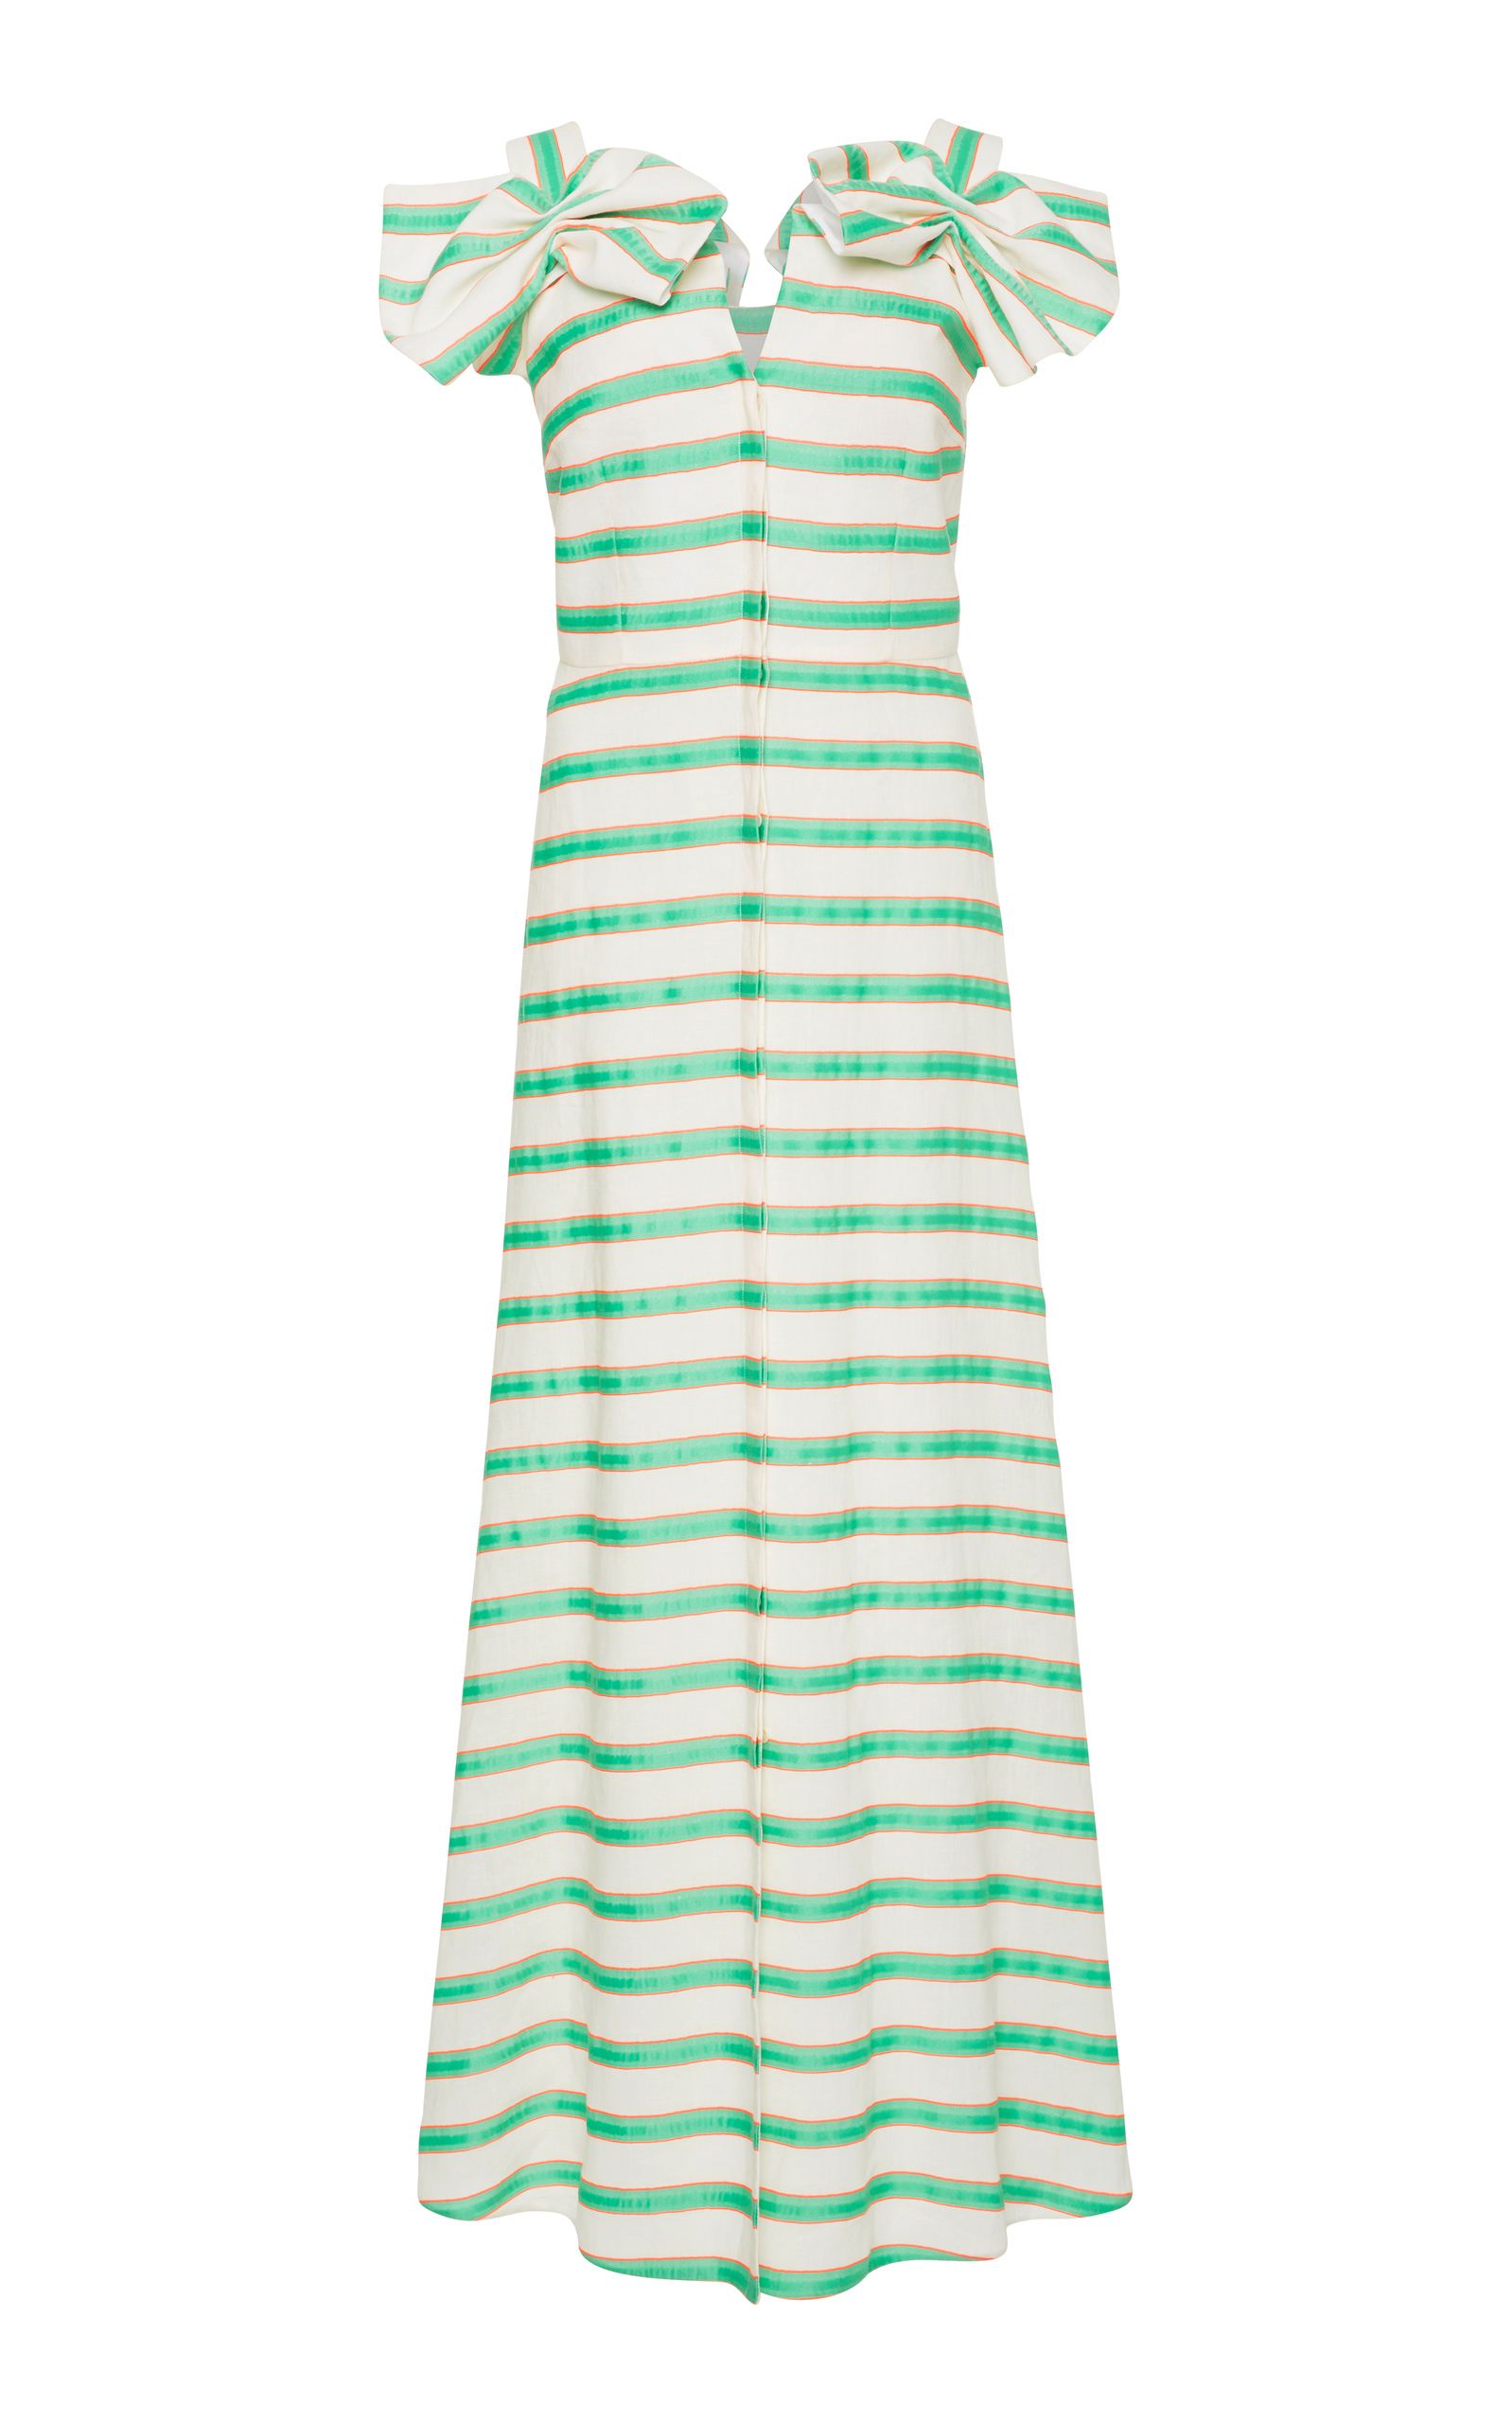 DELPOZO Bow-Embellished Striped Midi Dress in White